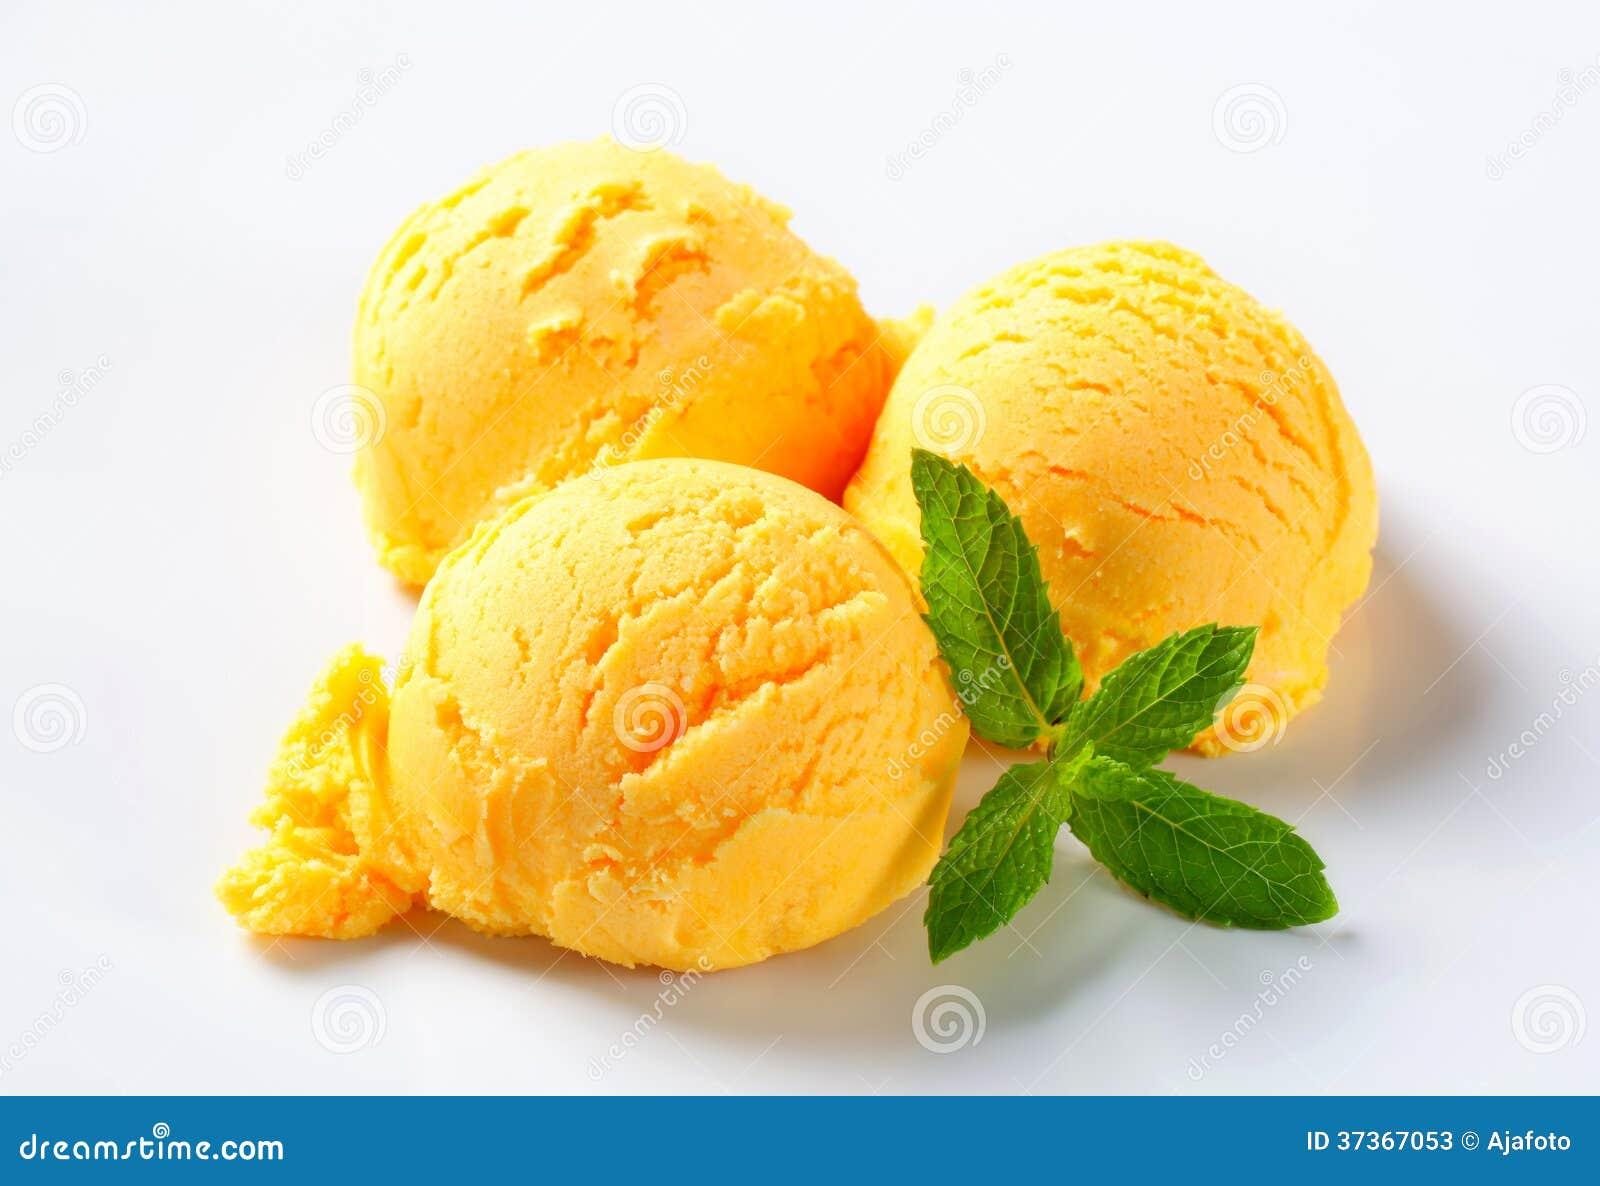 scoops-mango-sorbet-yellow-ice-cream-plate-37367053.jpg